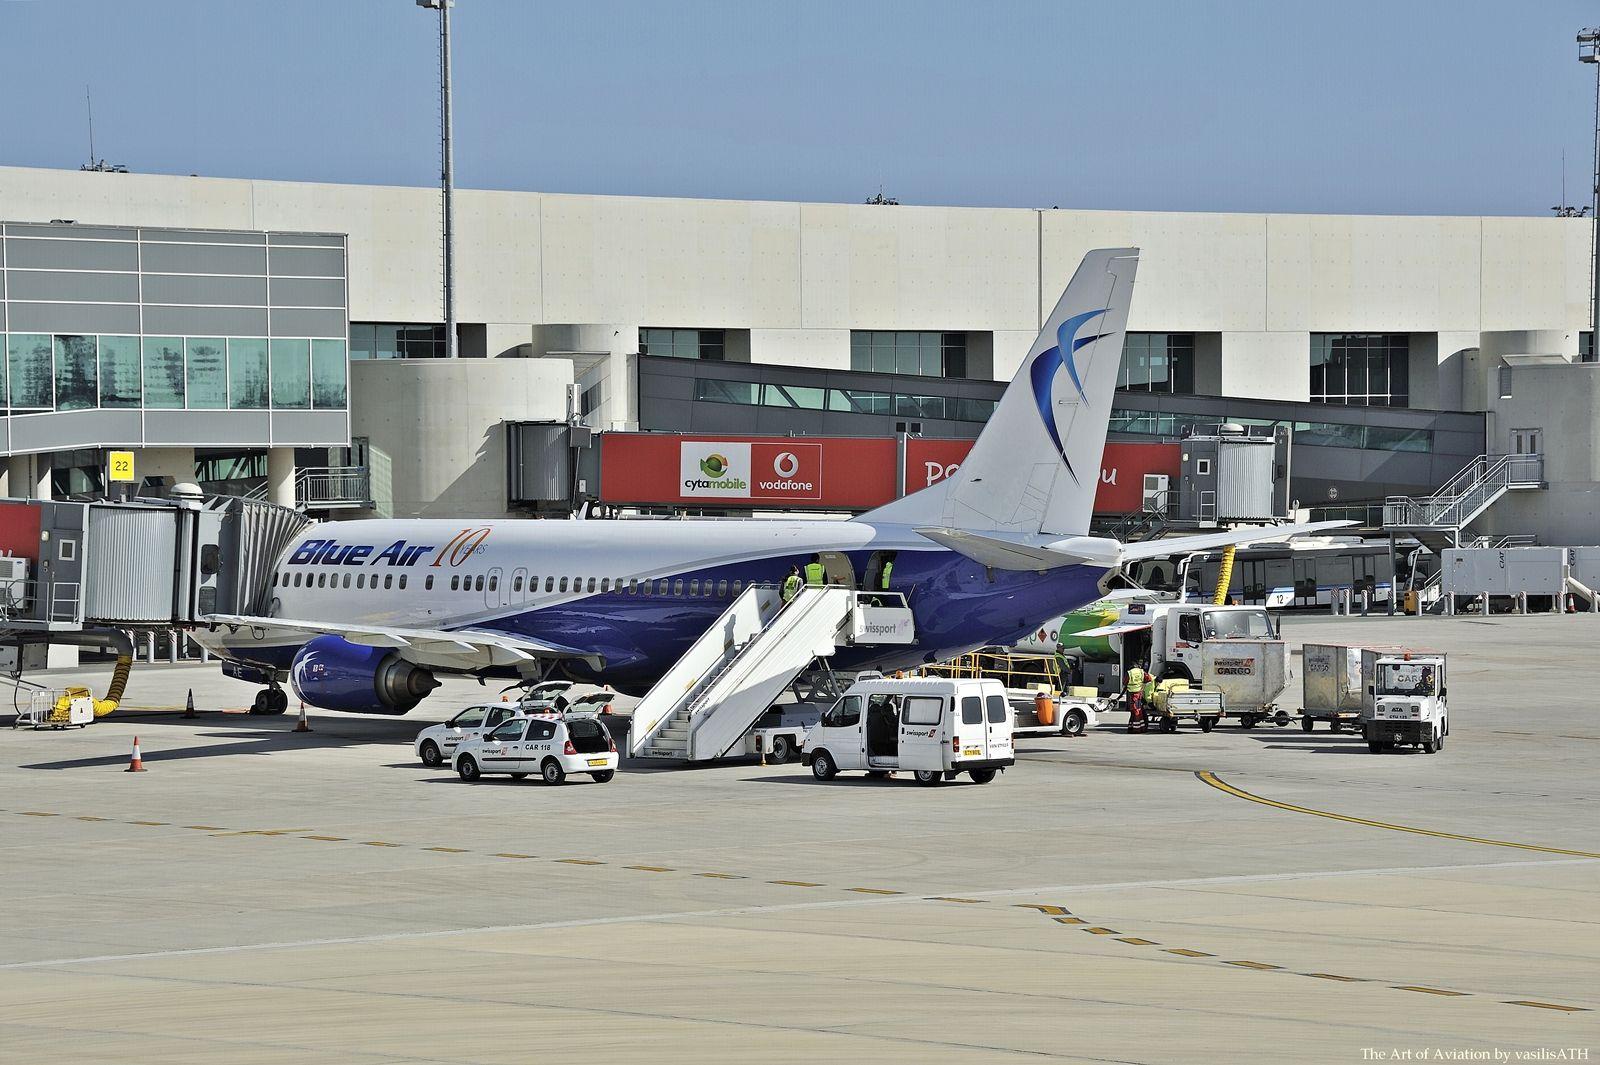 Aeroporto Waw : Blue air larnaca international airport iata: lca u2013 icao: lclk